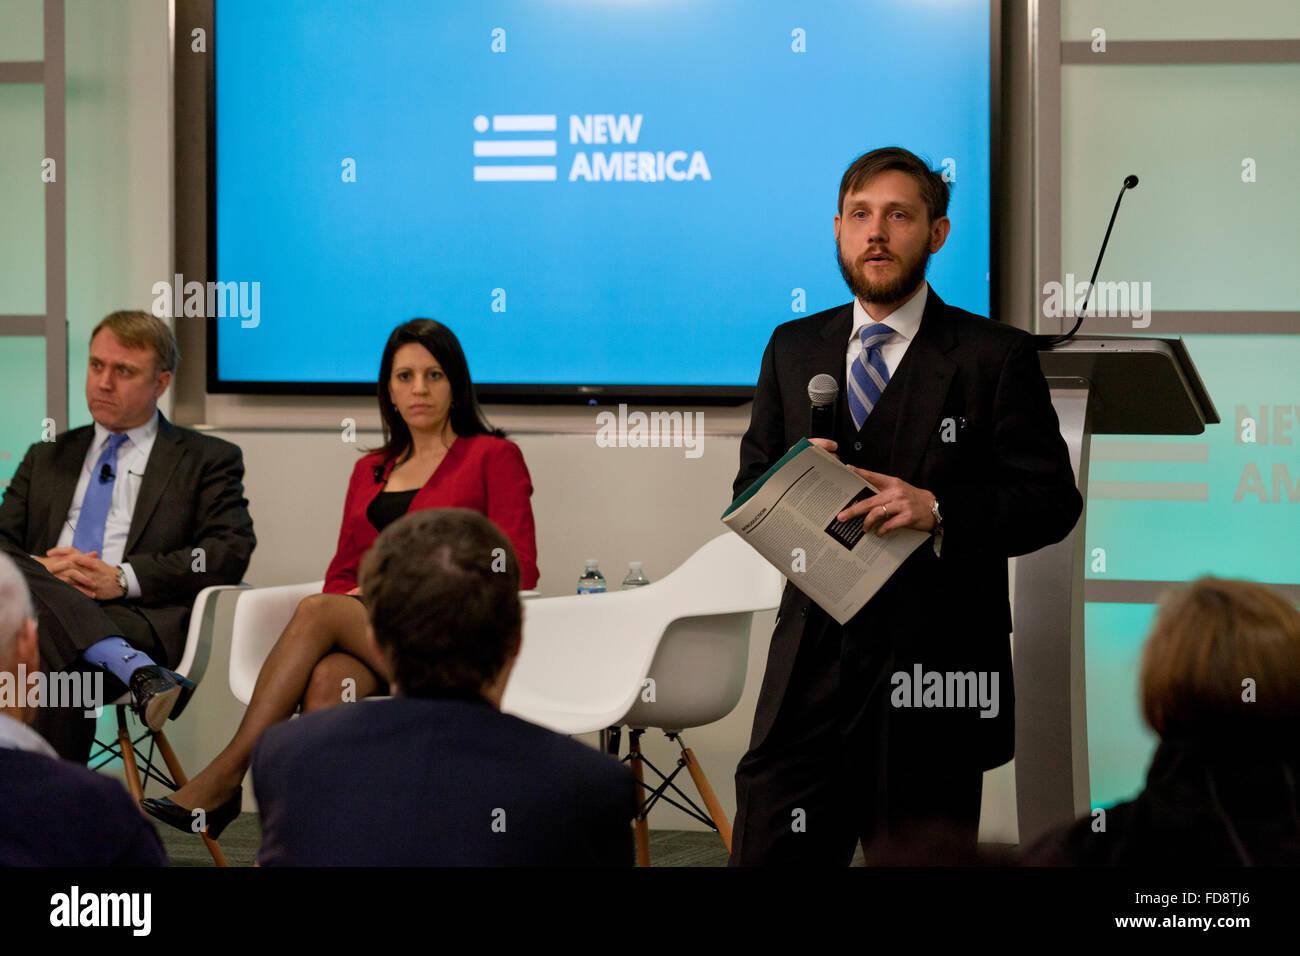 Dveed Gartenstein-Ross speaking on Jihadist Movement conflicts at New America - December 04, 2015, Washington, DC - Stock Image